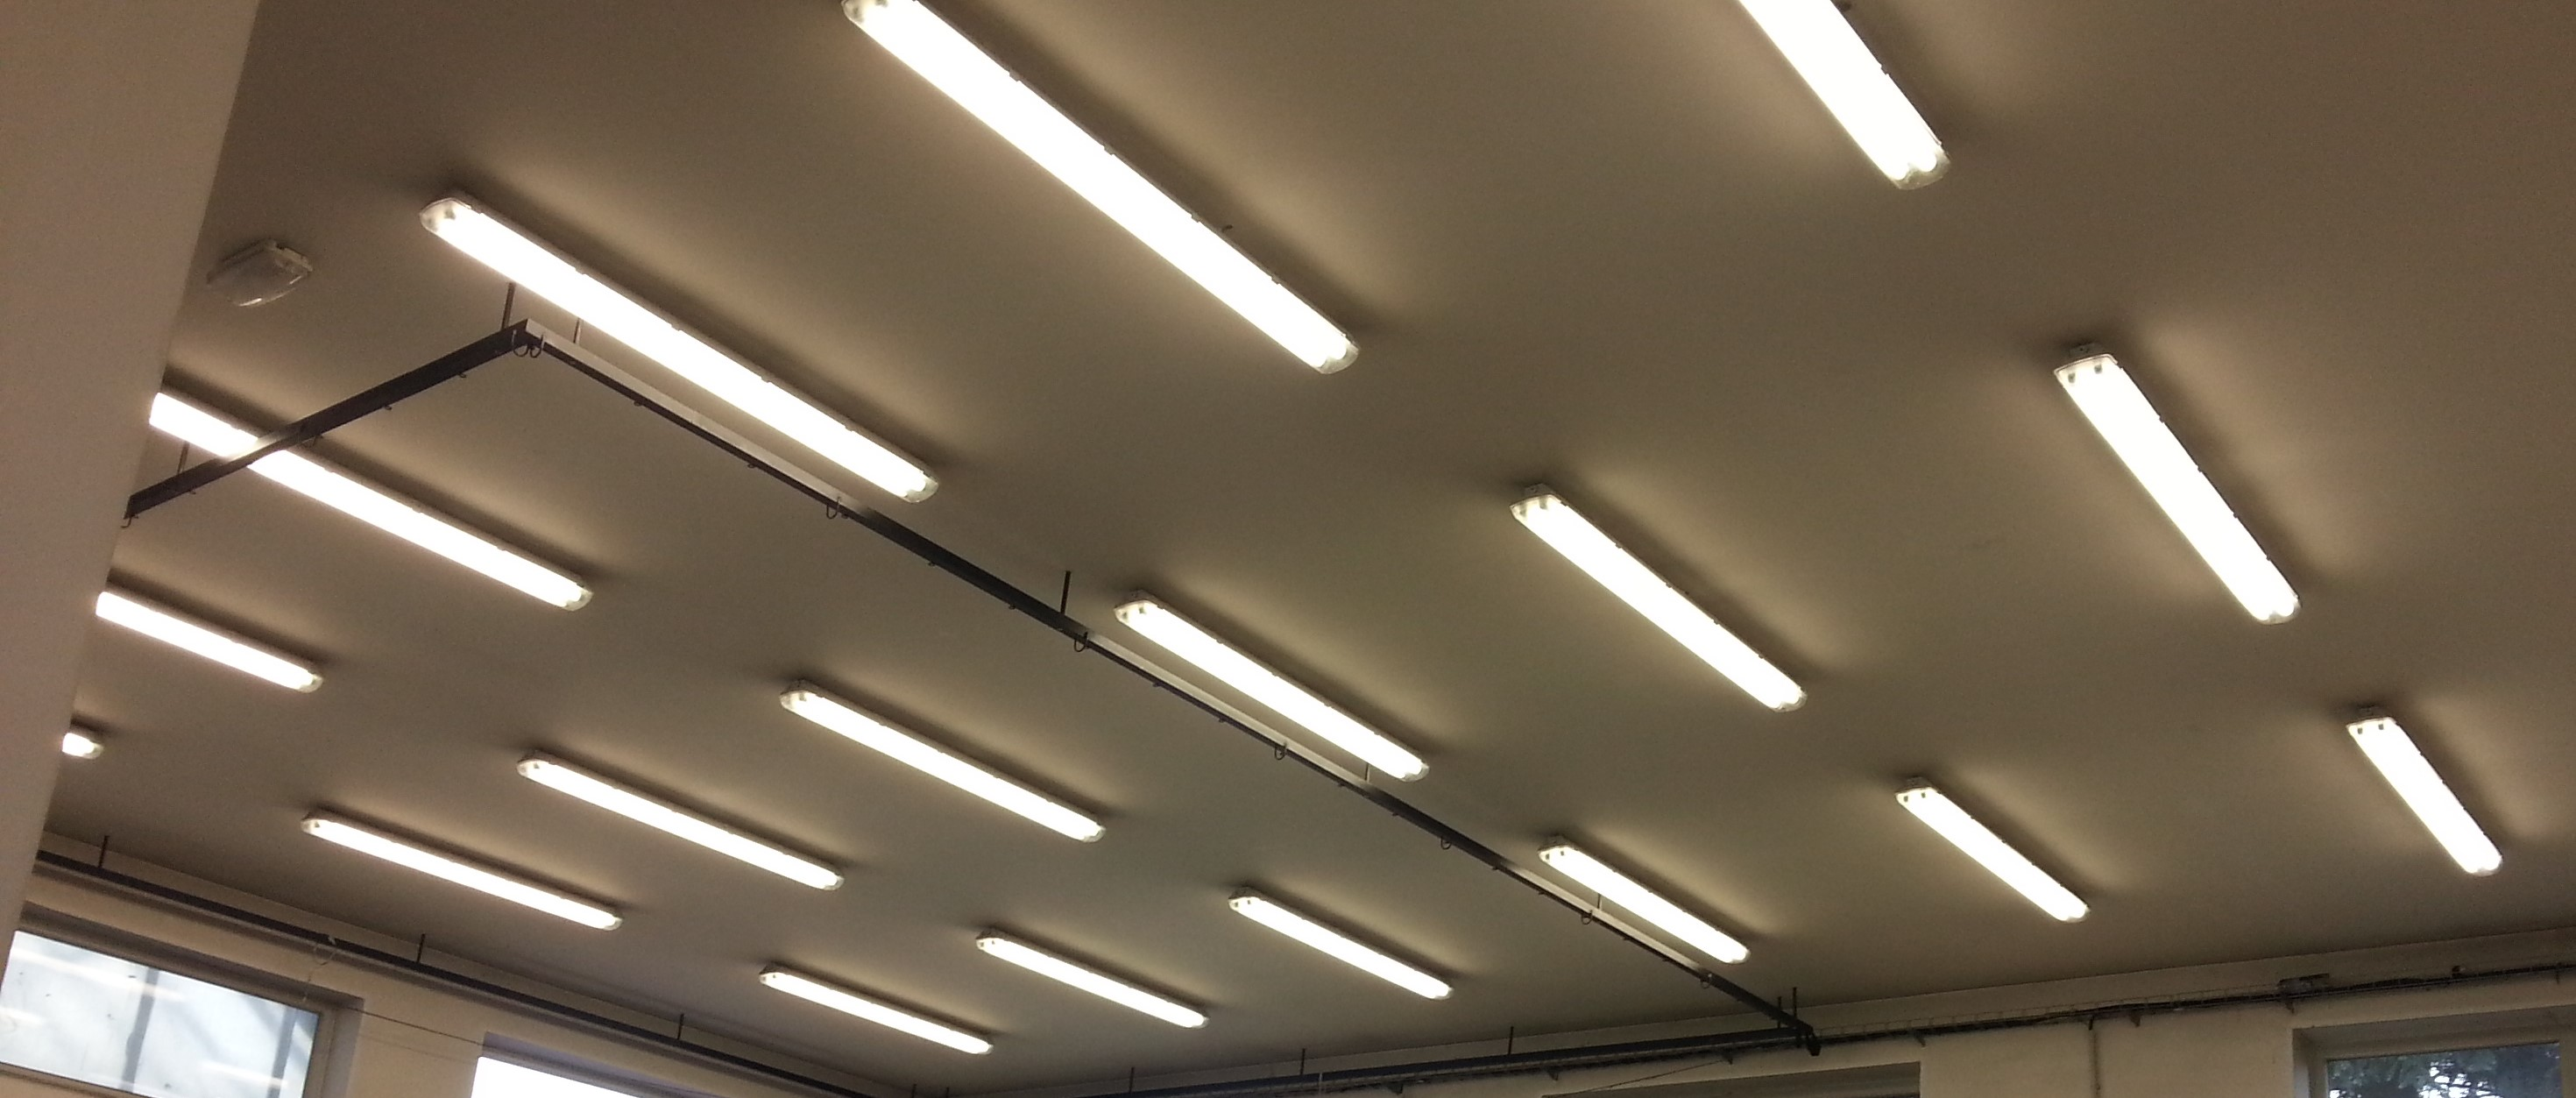 LED-zarivky_autoservis_barva_svetla_levne_kvalitni_trubice_LED_svitidla